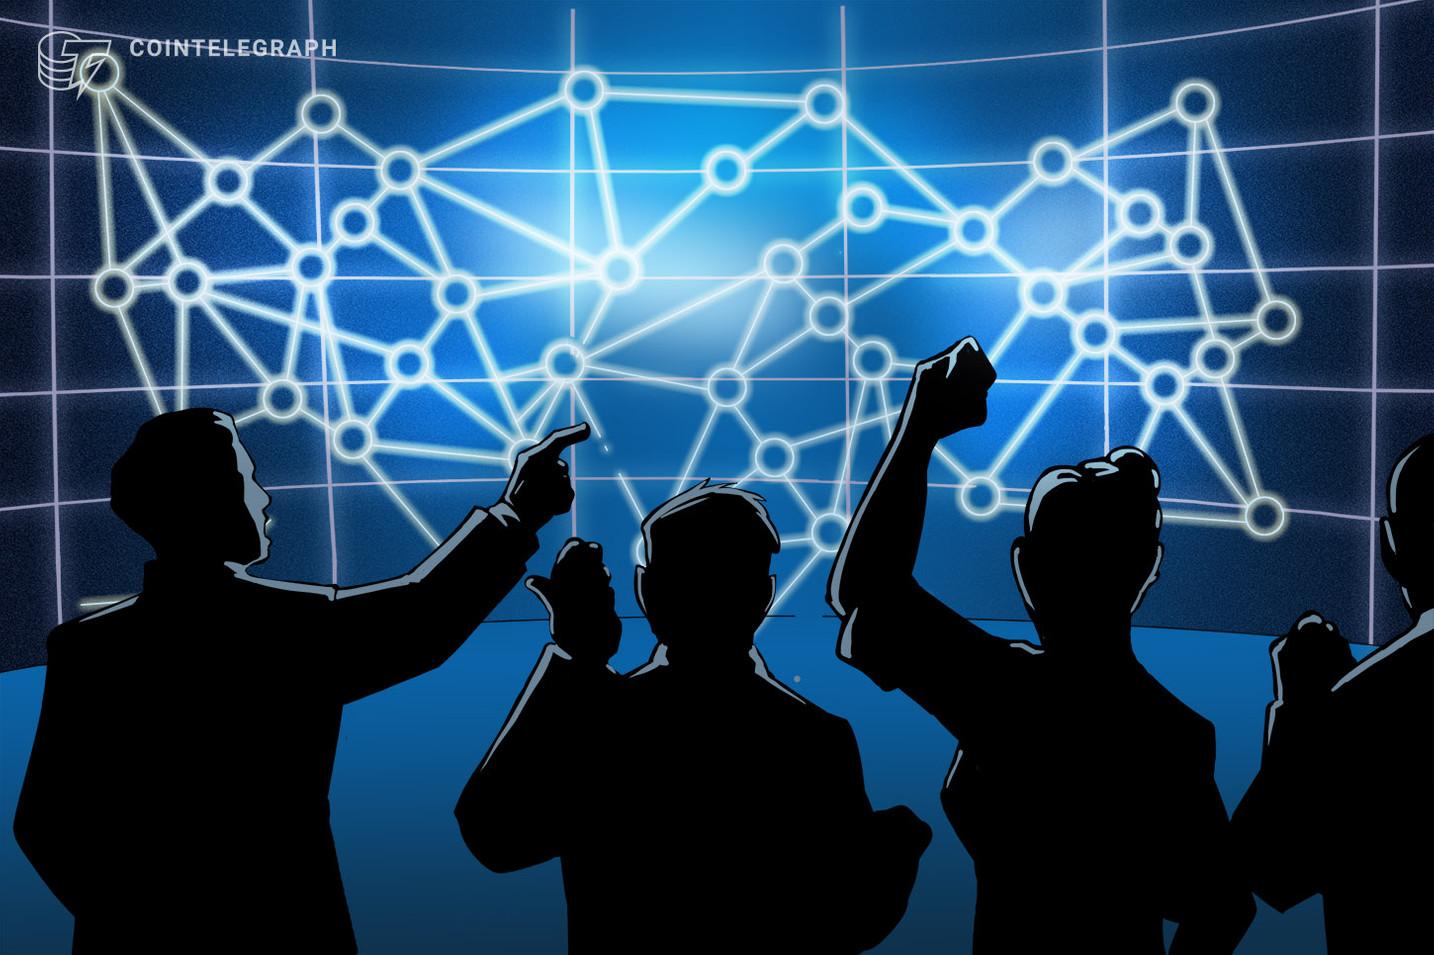 IBMの1700人解雇 ブロックチェーン部門への影響「ほとんどない」